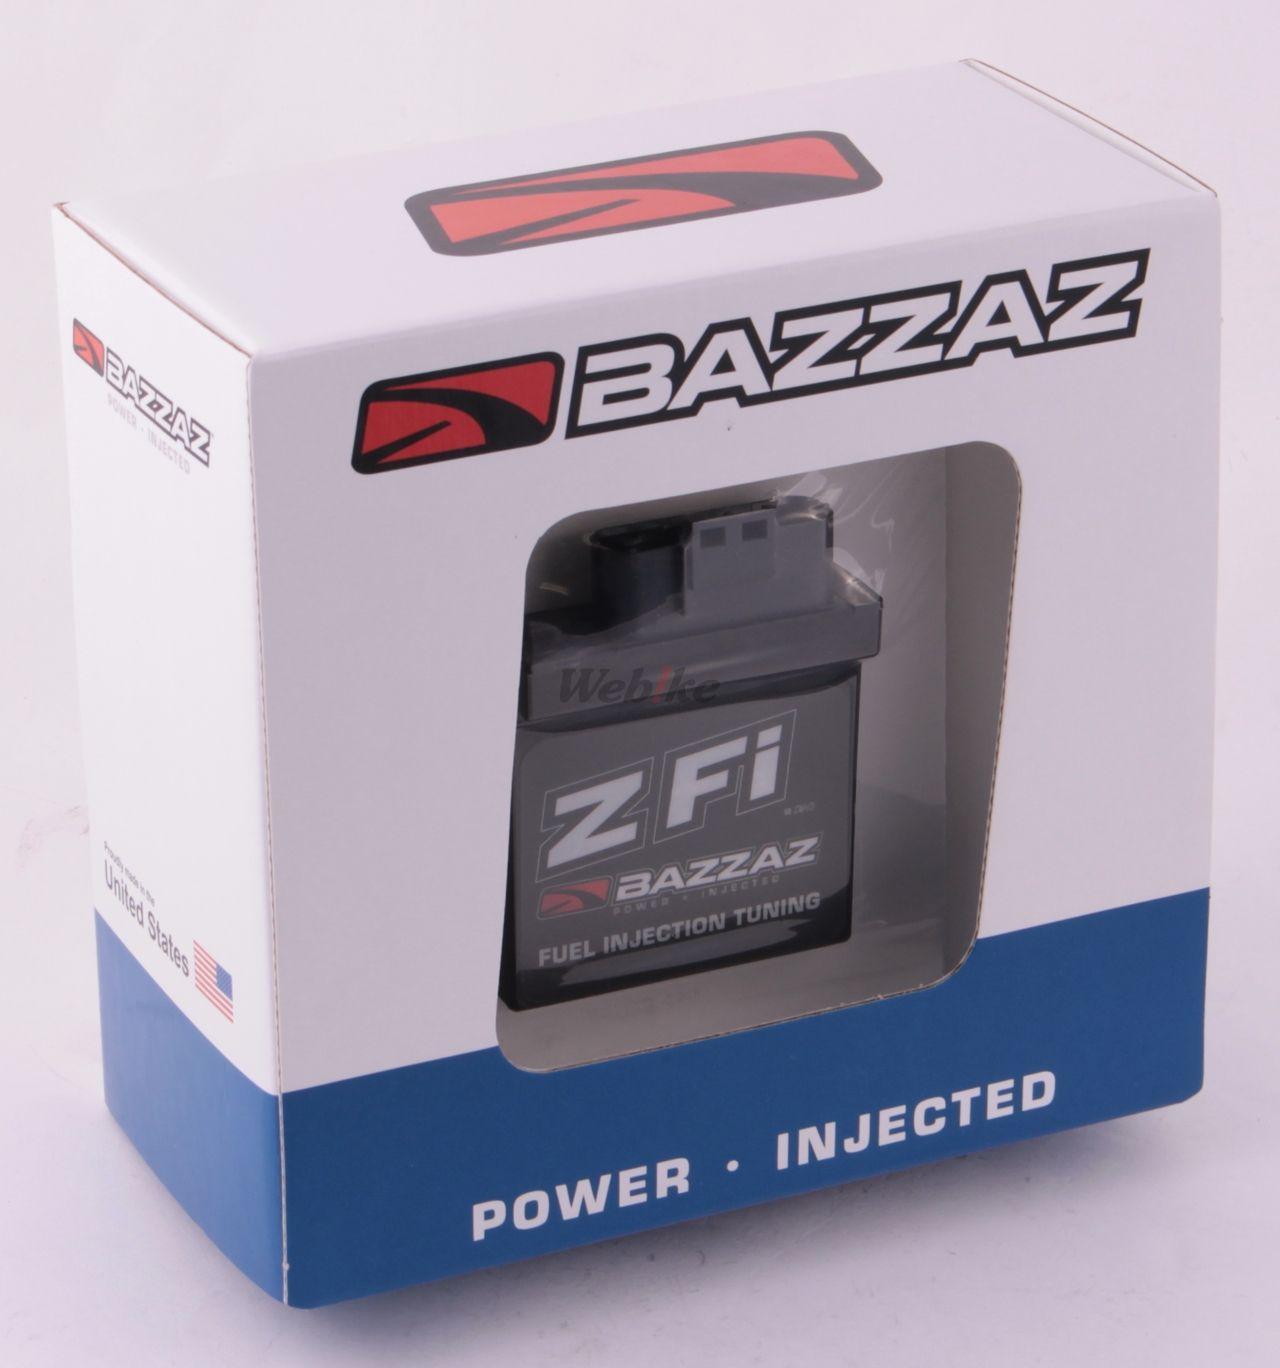 【YOSHIMURA】BAZZAZ : Bazaars Z-Fi油量控制組 - 「Webike-摩托百貨」